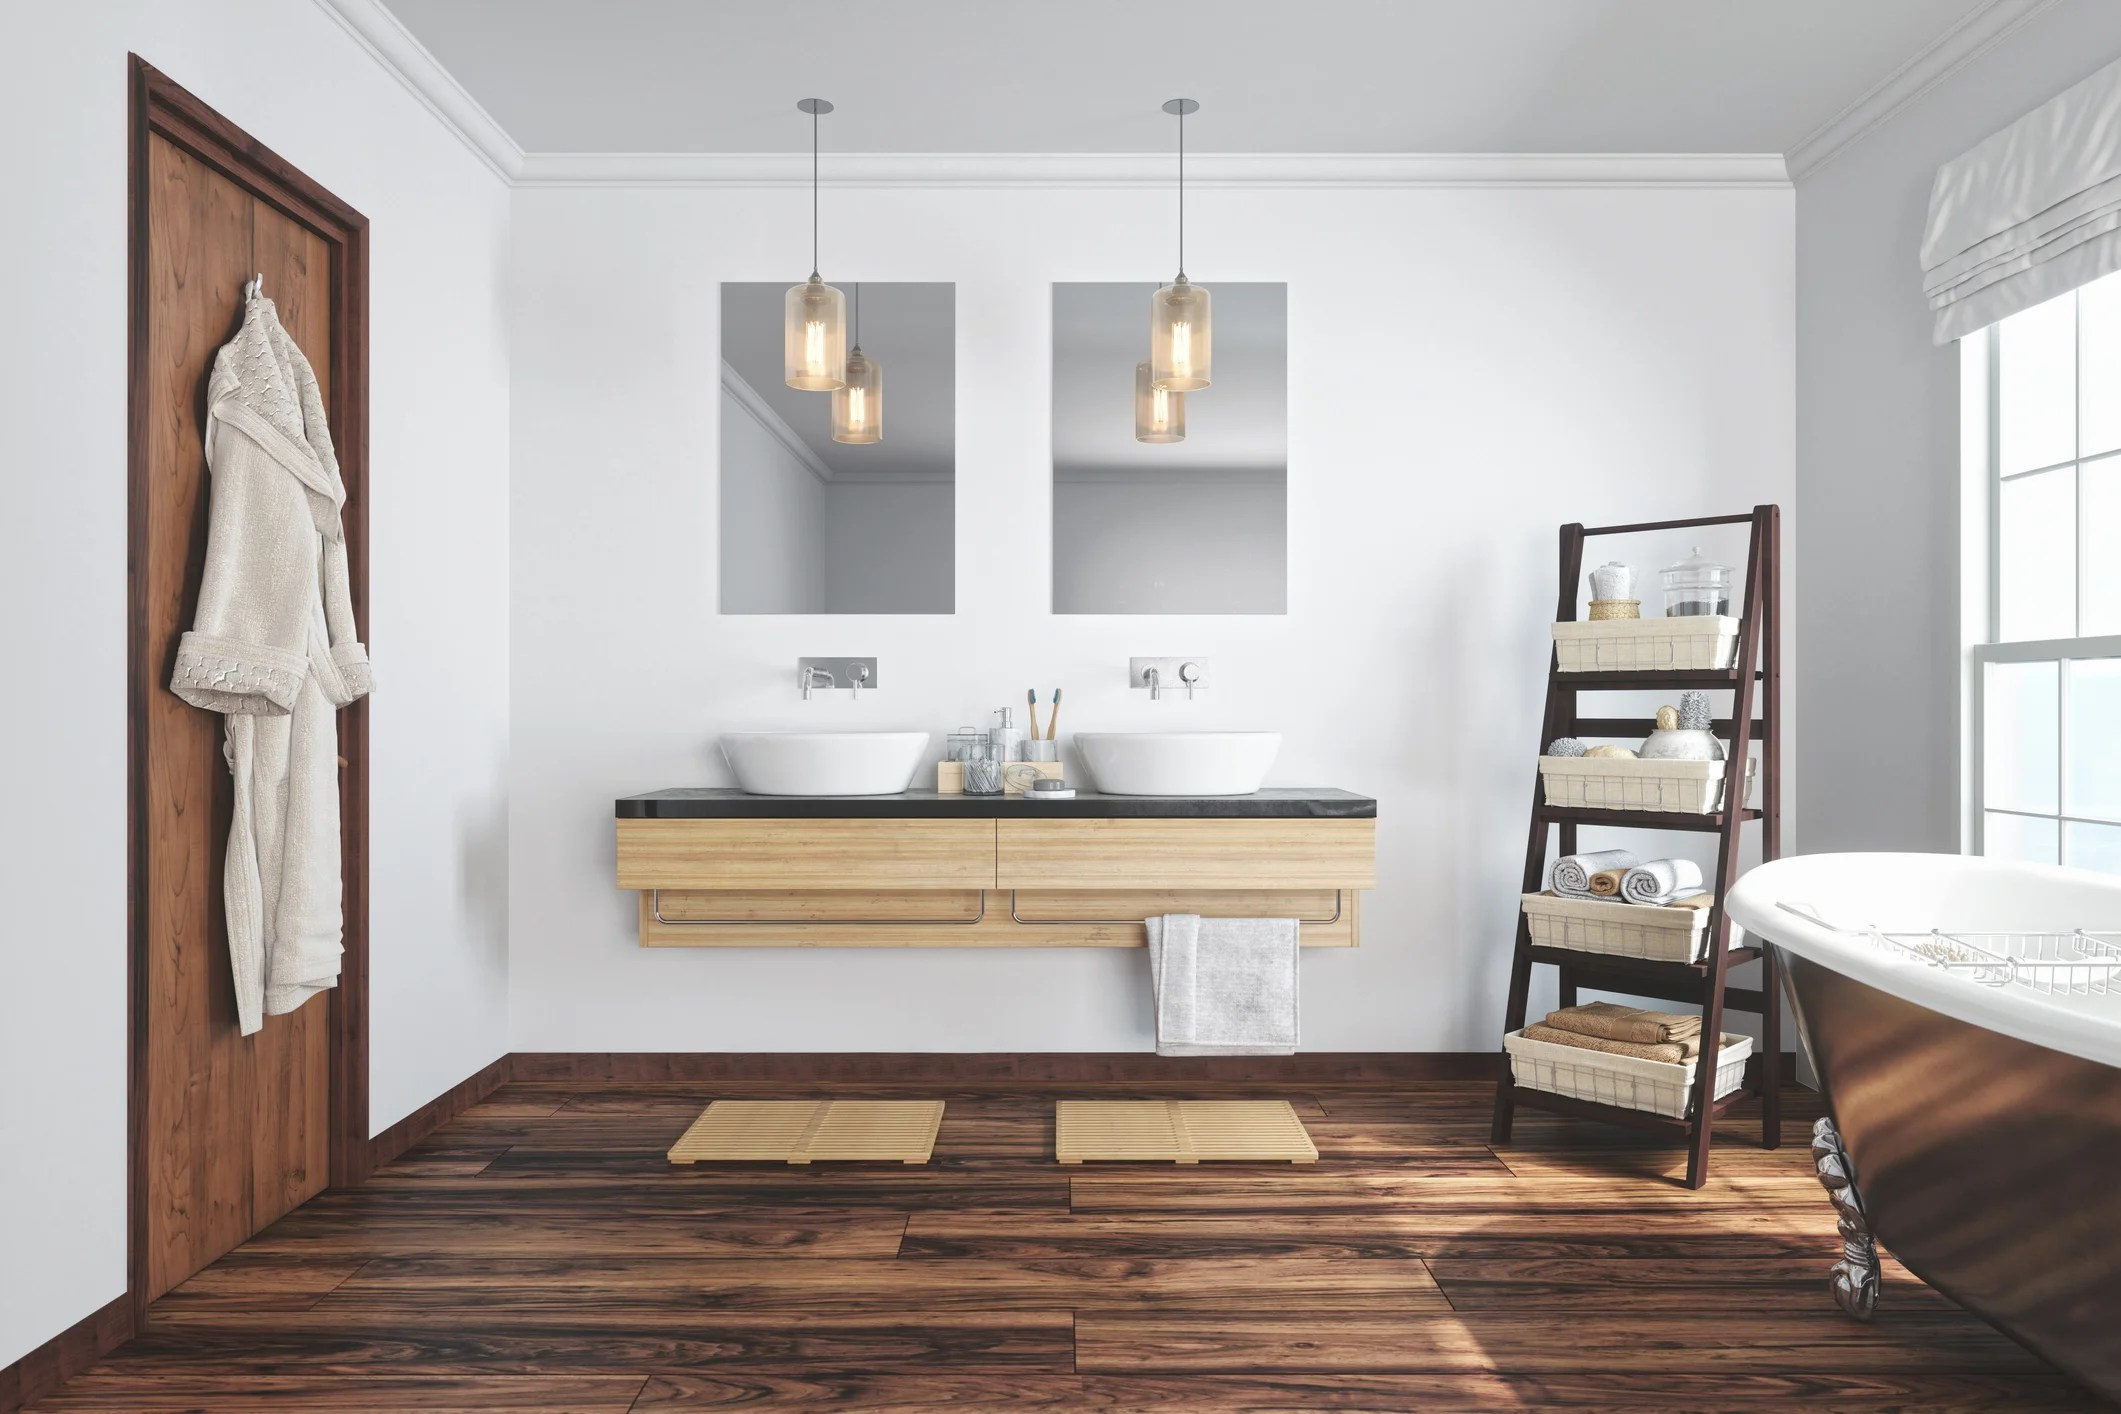 4 Bathroom Decor Ideas To Help Your Bathroom Stand Out Millionacres